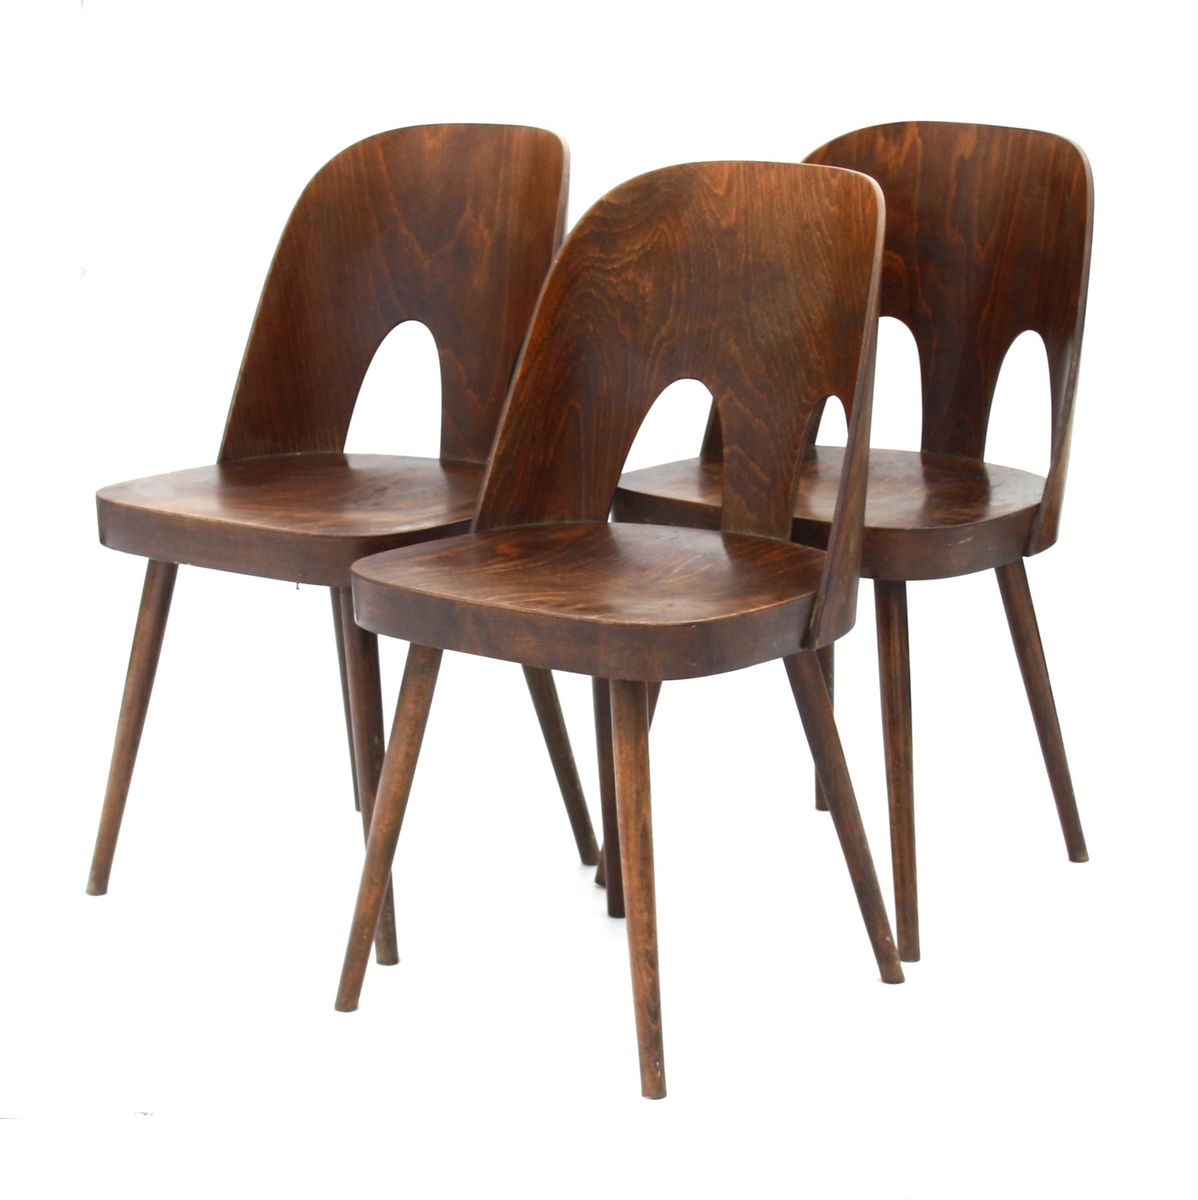 st hle von ton 1950er 3er set bei pamono kaufen. Black Bedroom Furniture Sets. Home Design Ideas